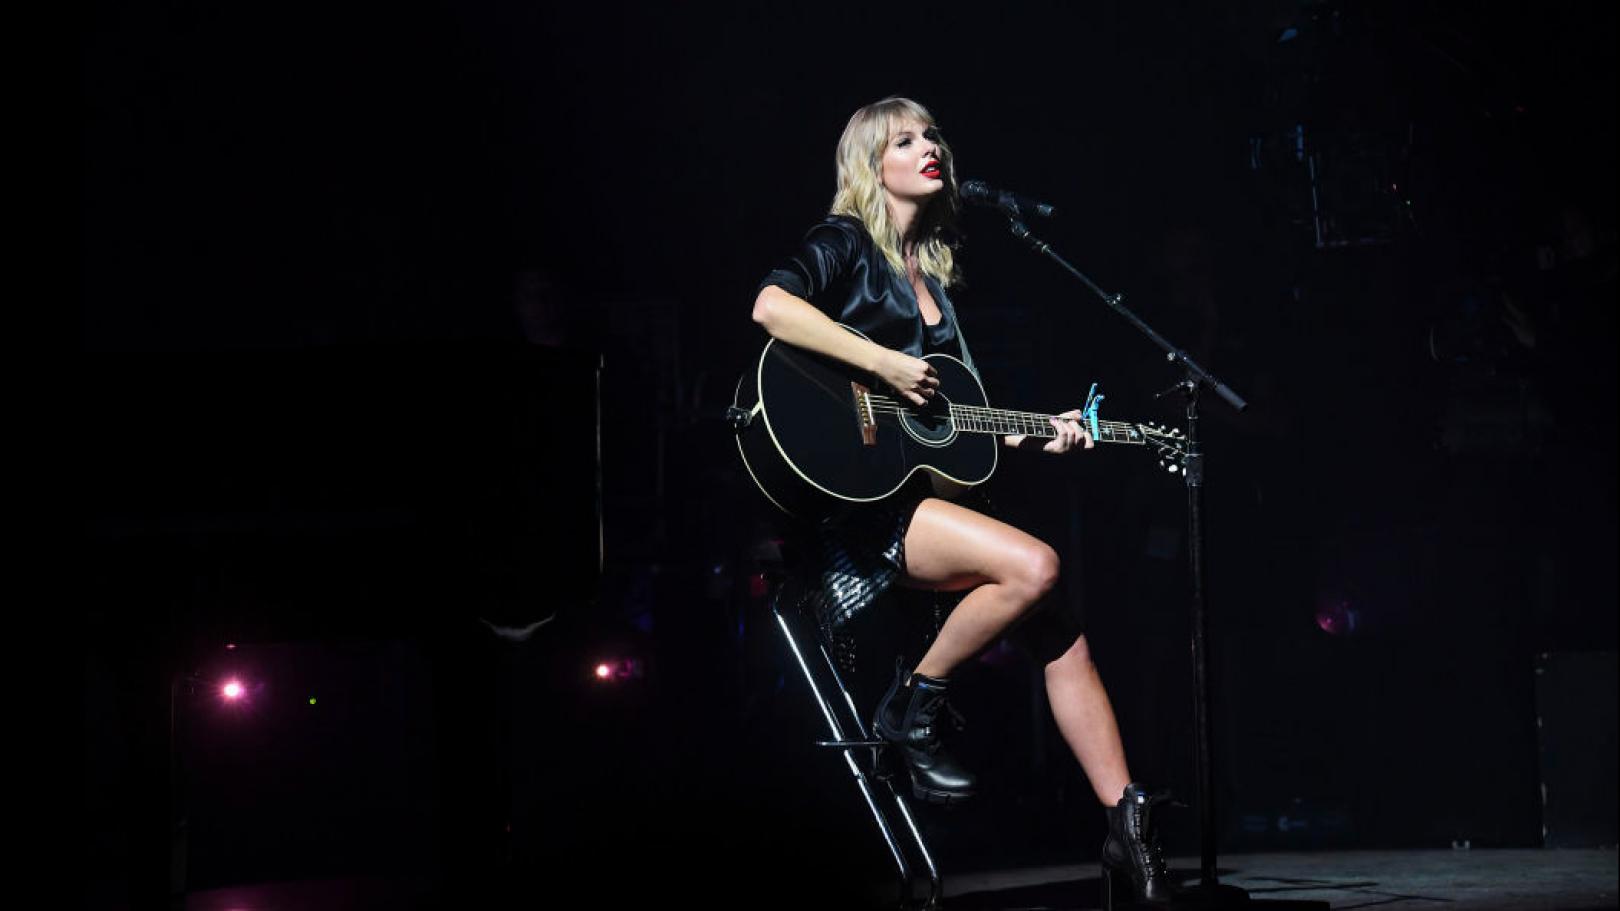 Taylor Swift announces free 2020 concert